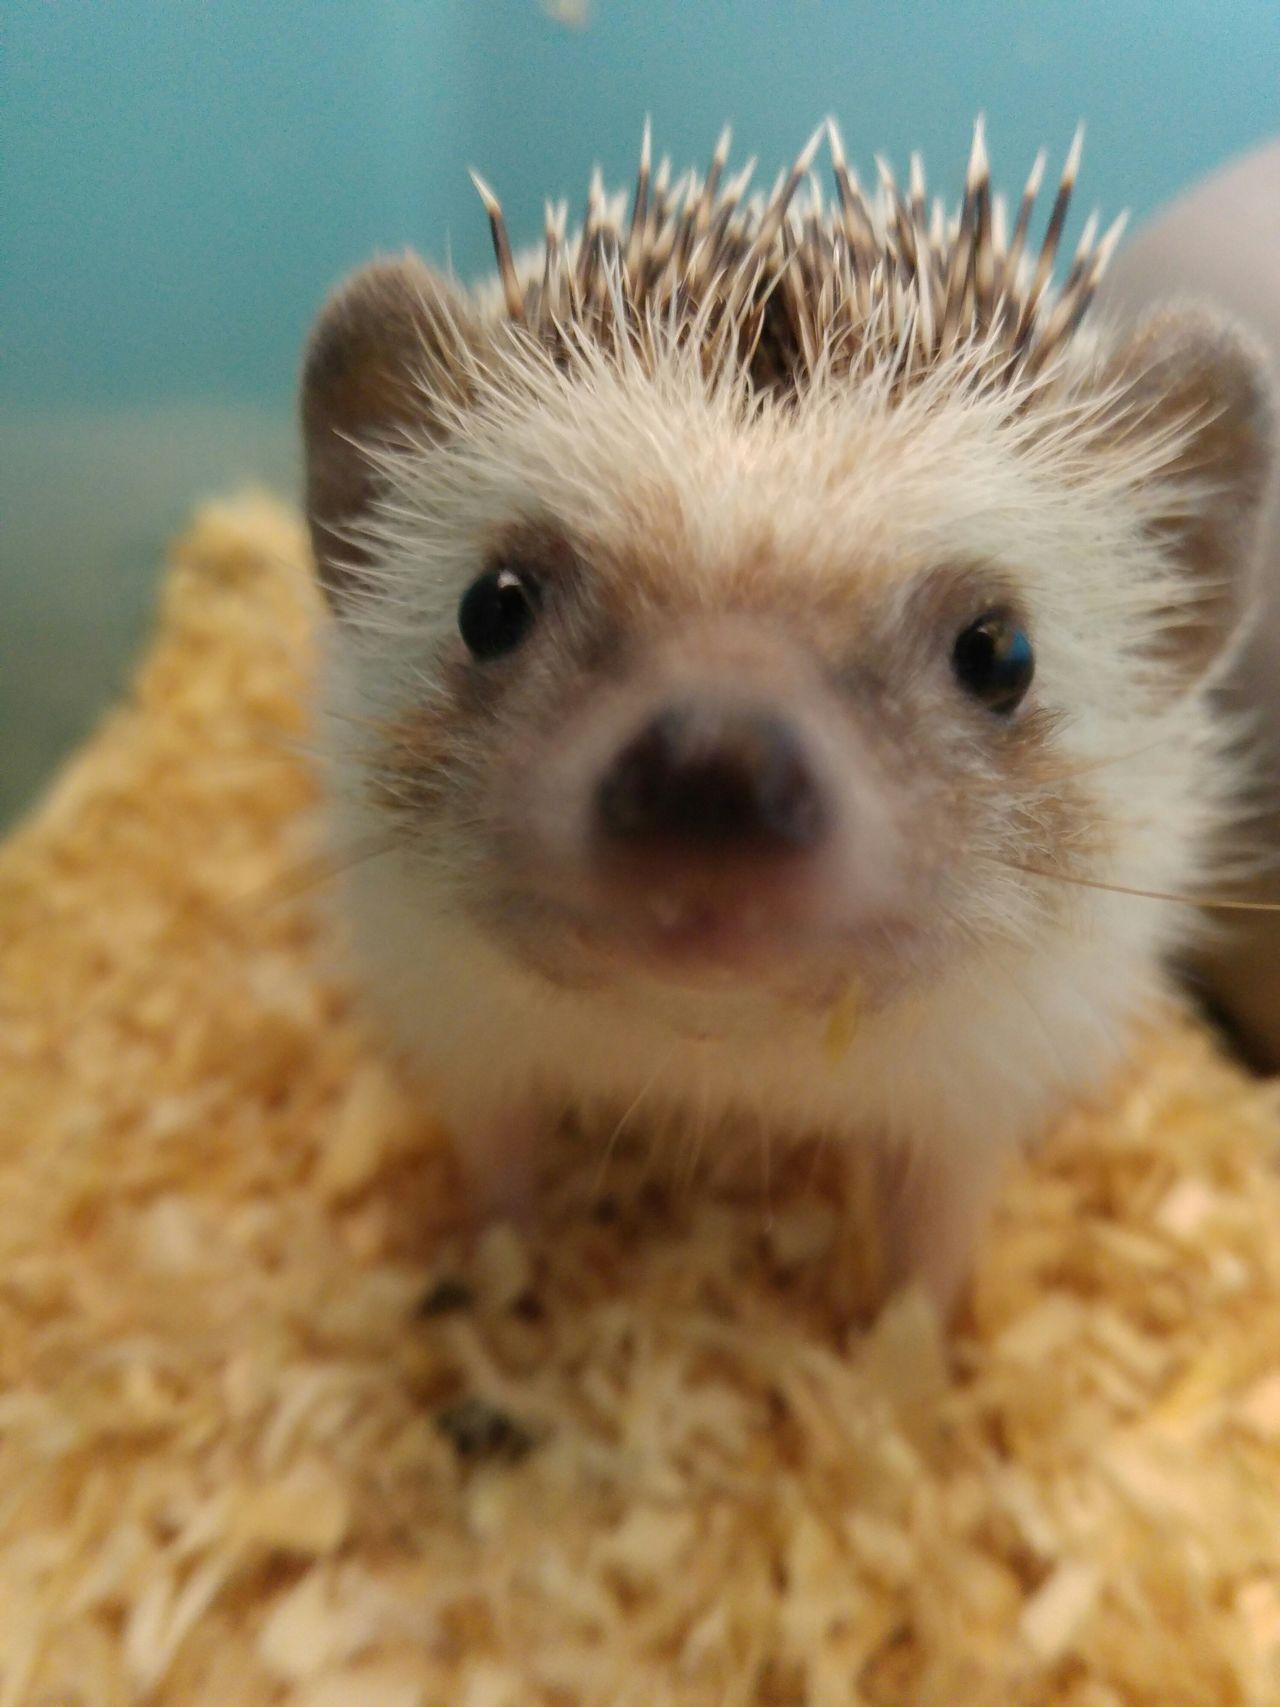 Capture The Moment Hedgehog